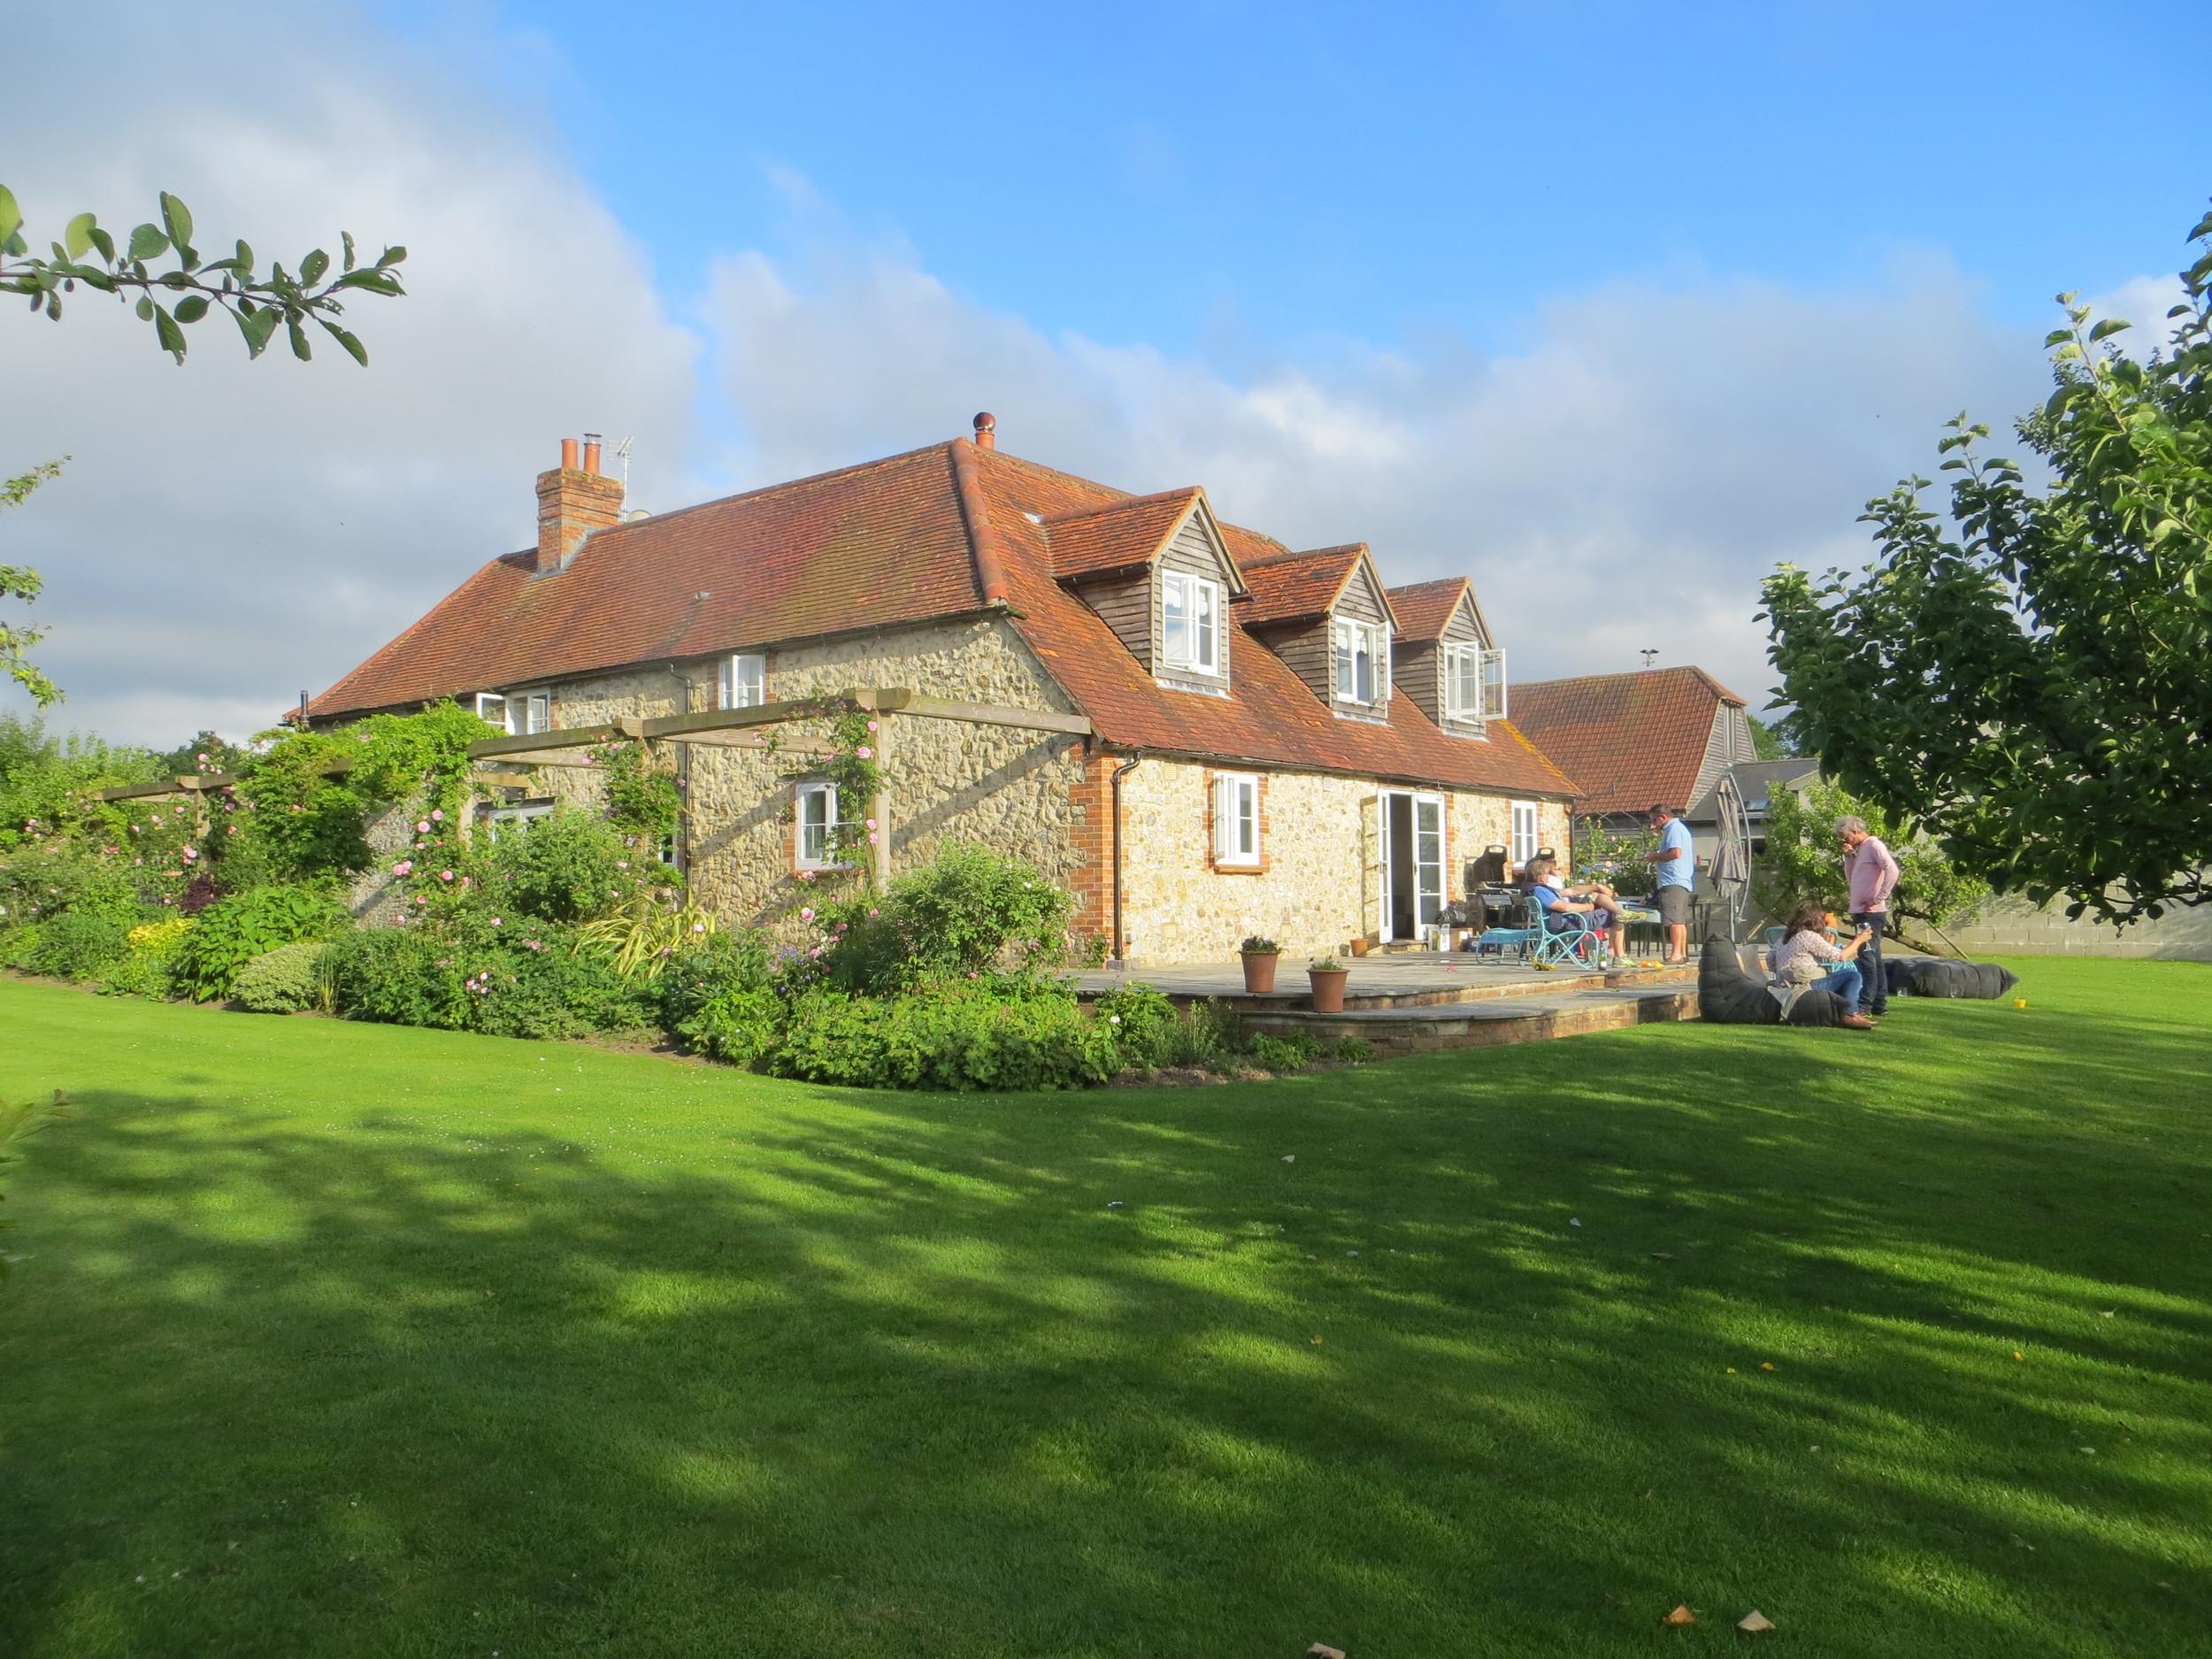 The Farmhouse for retreat